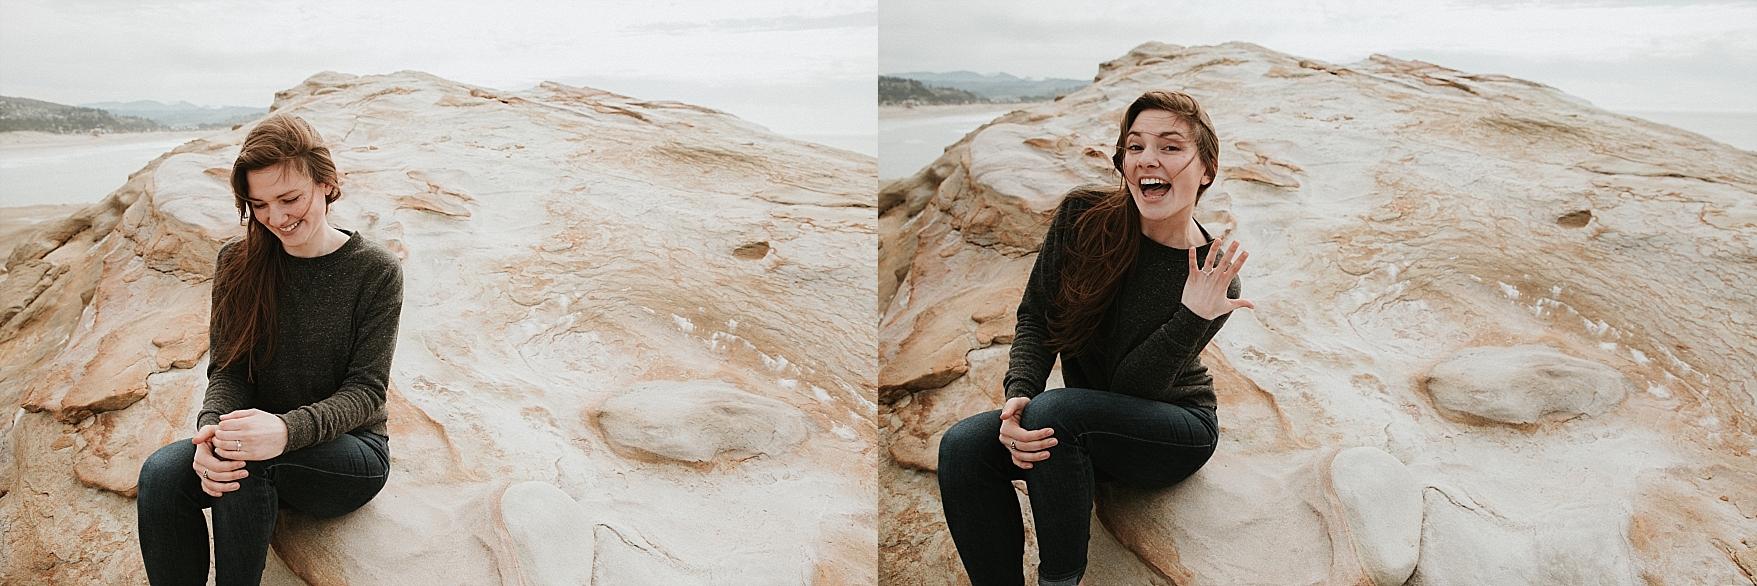 Oregon Engagement Photographer (11).jpg